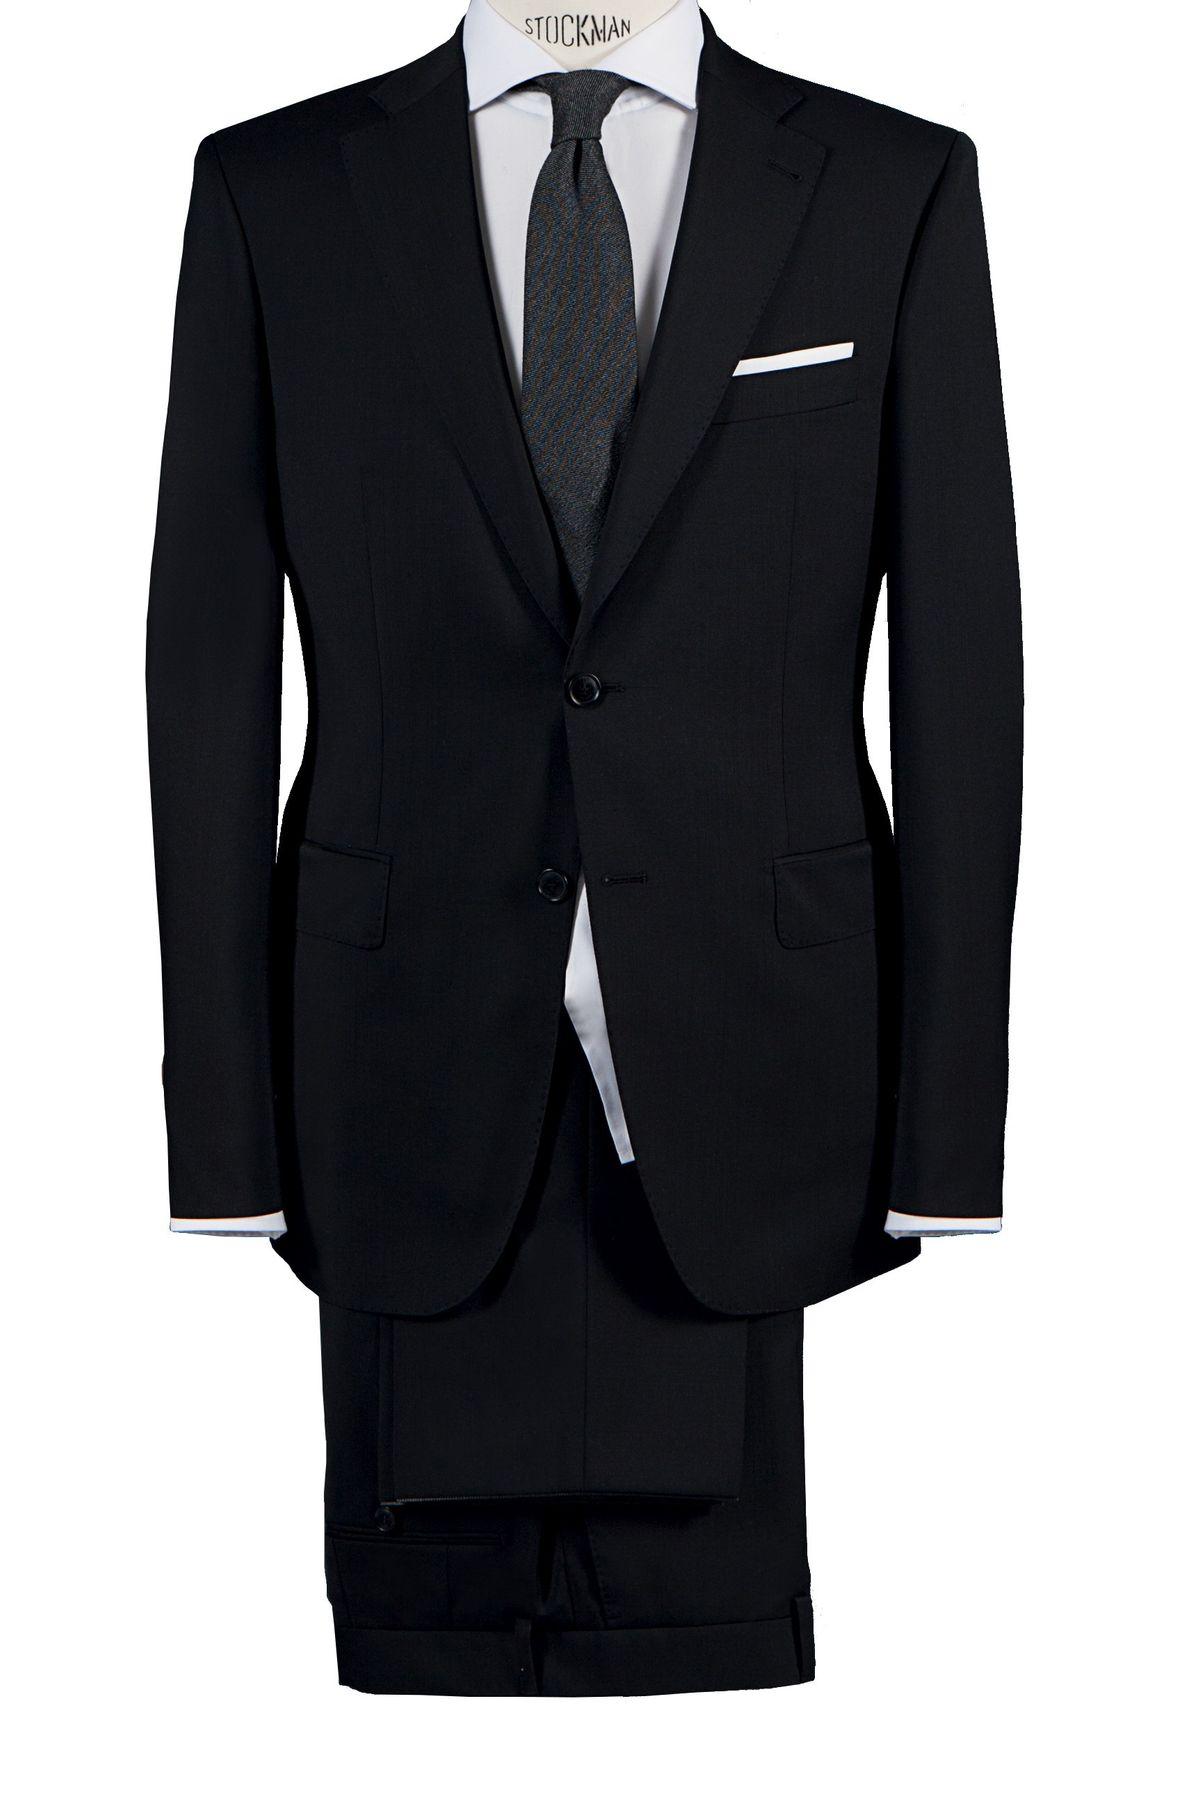 Barutti - Tailored Fit - Herren Baukasten Anzug/Reiseanzug, 900 8009 (Tarso P AMF/Tosco) – Bild 1